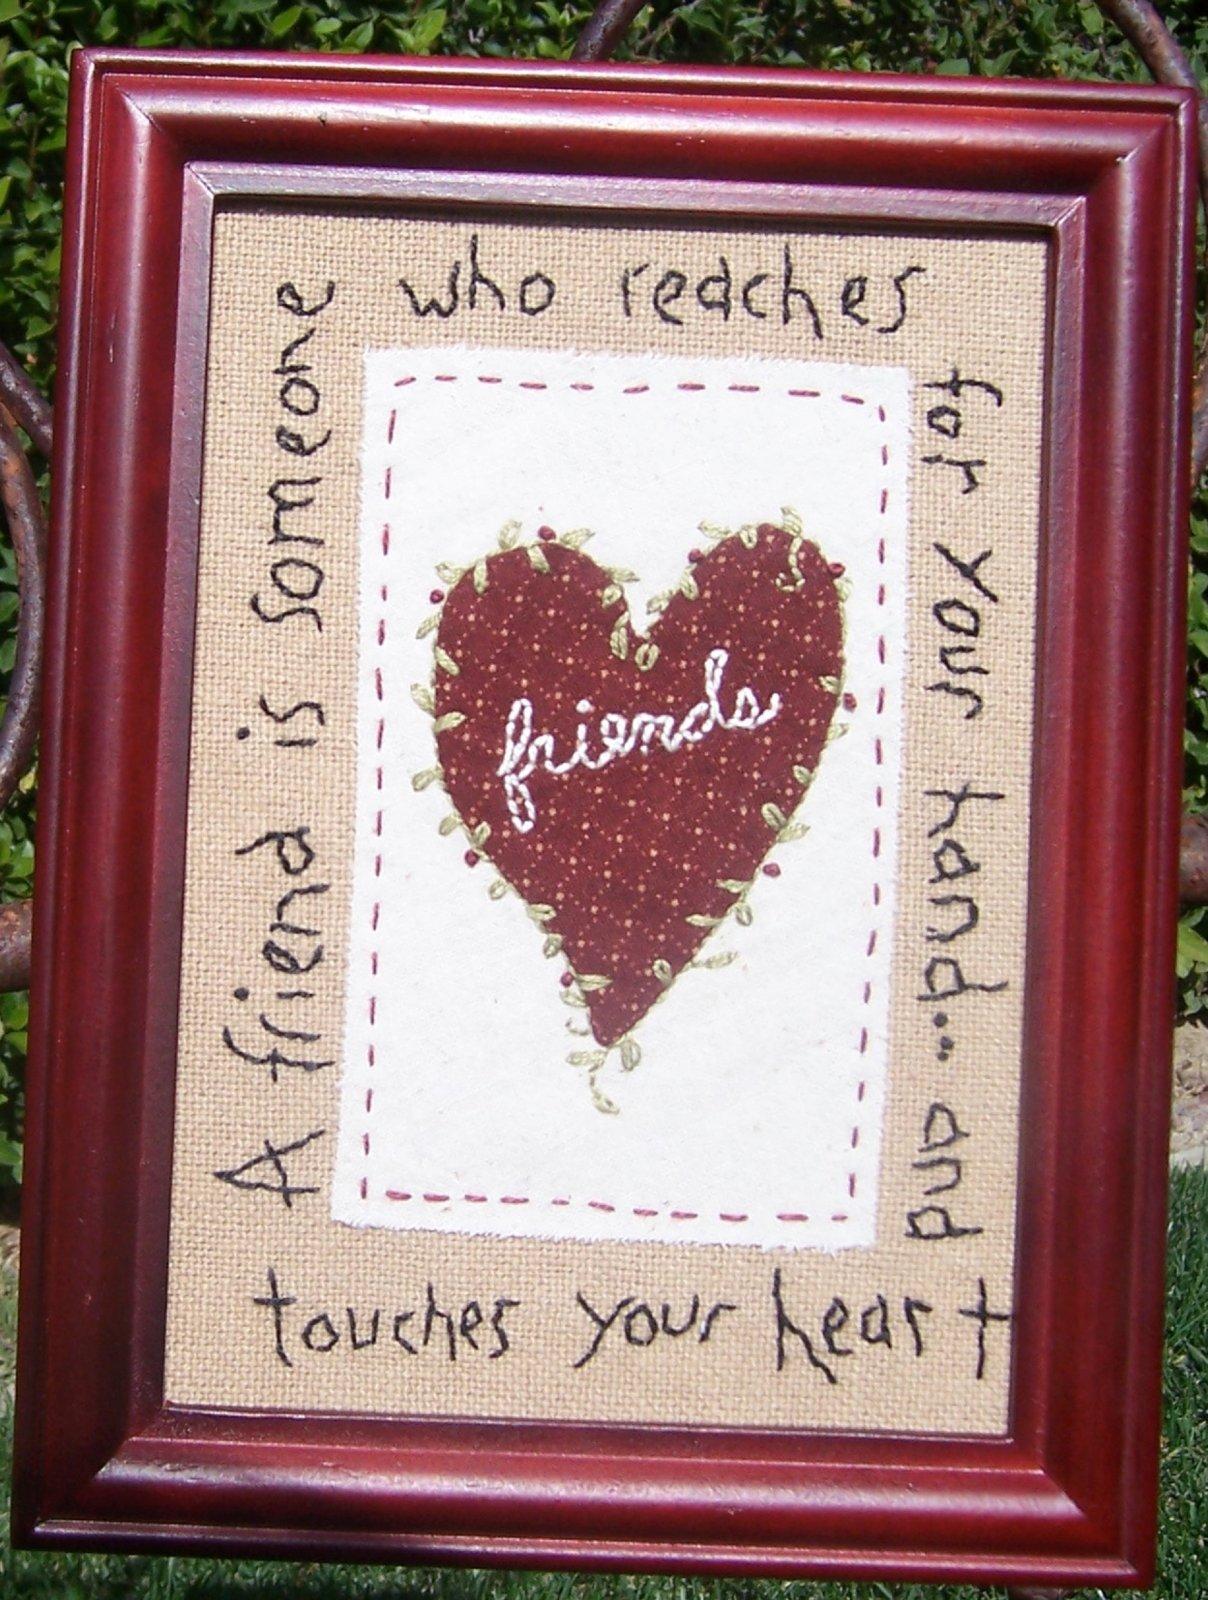 Friends Reach -  Embriodery Kit - 5 x 7